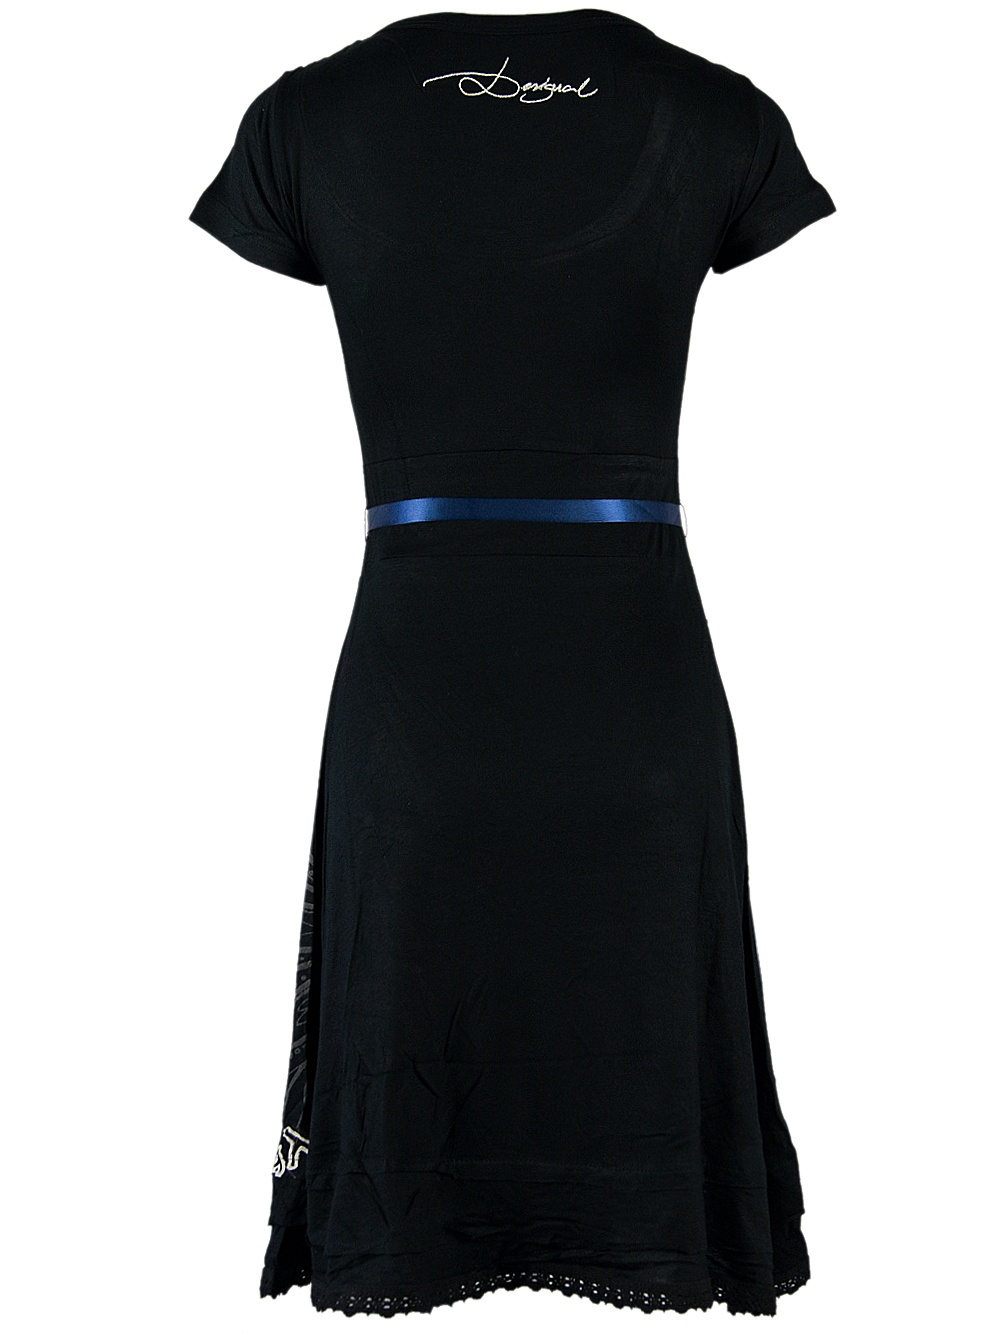 Damen Kleid Puerto Plata (schwarz)